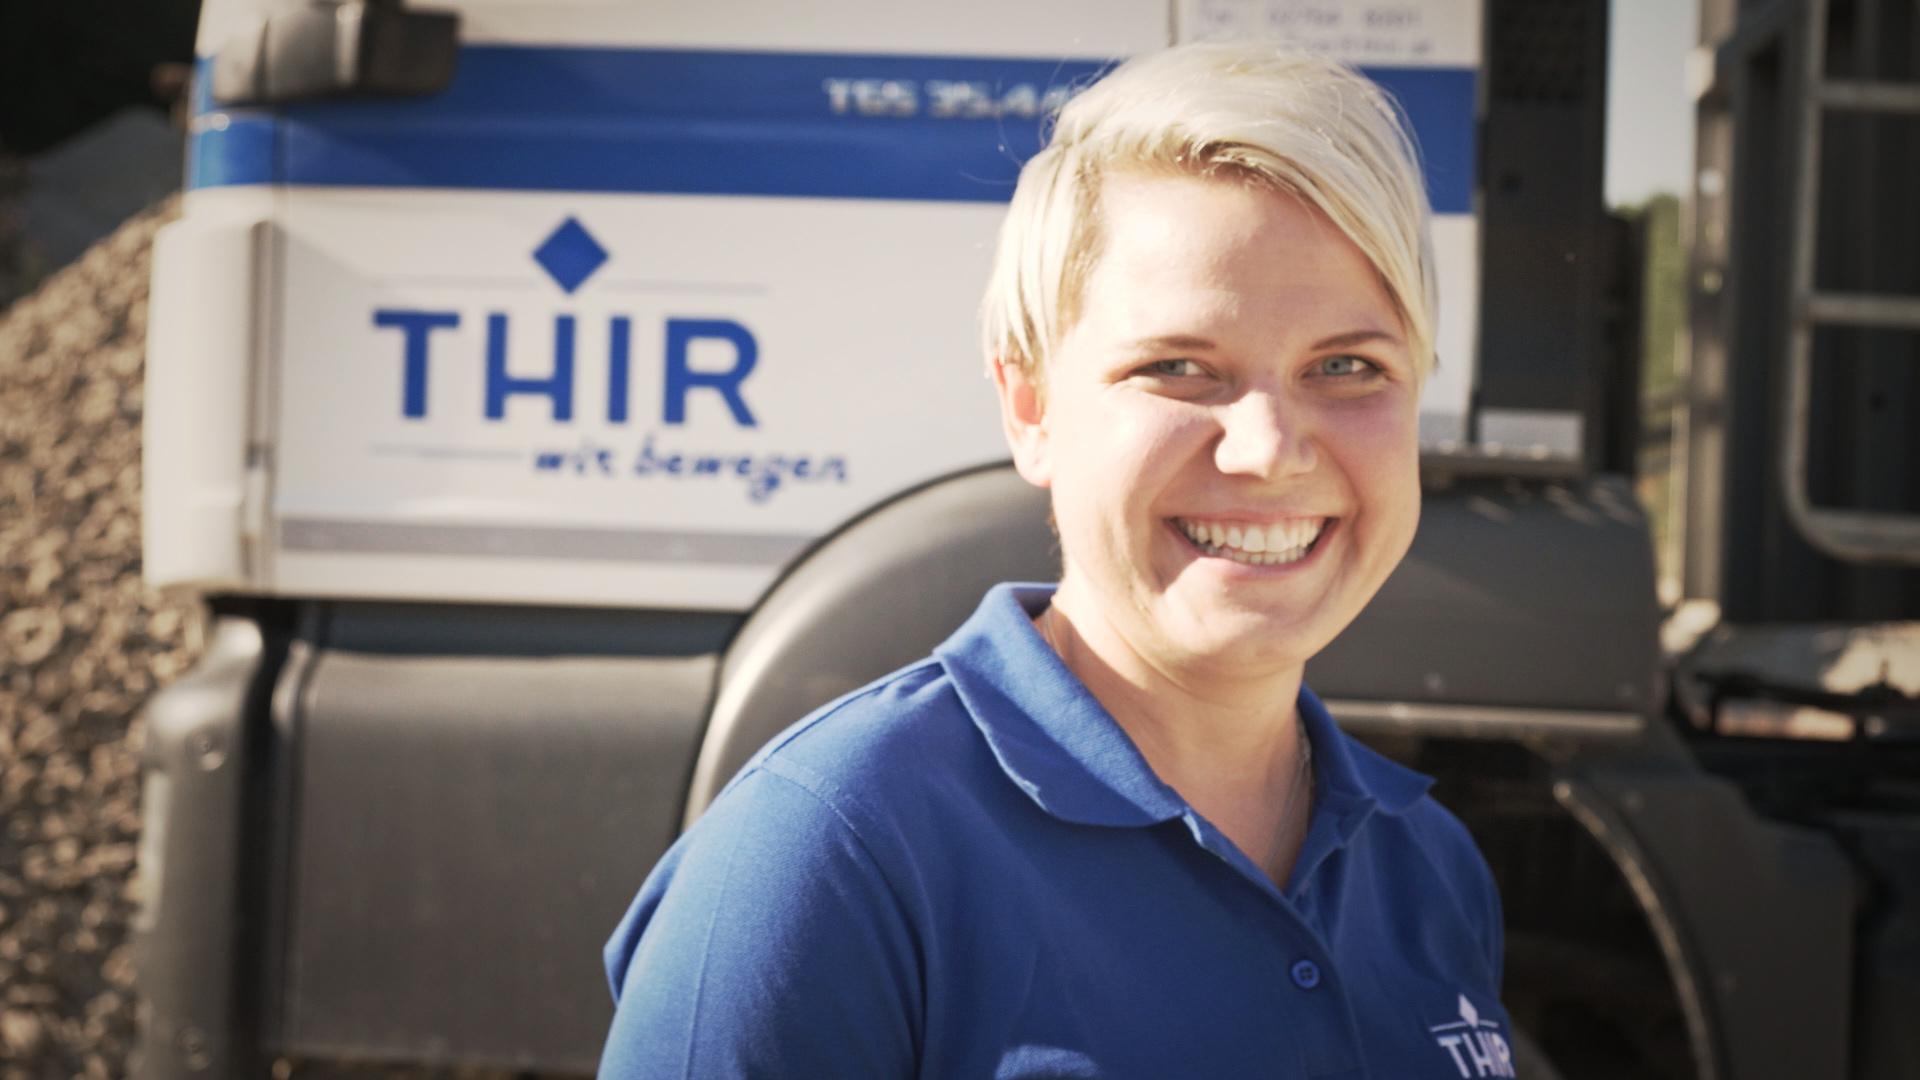 Thir GmbH